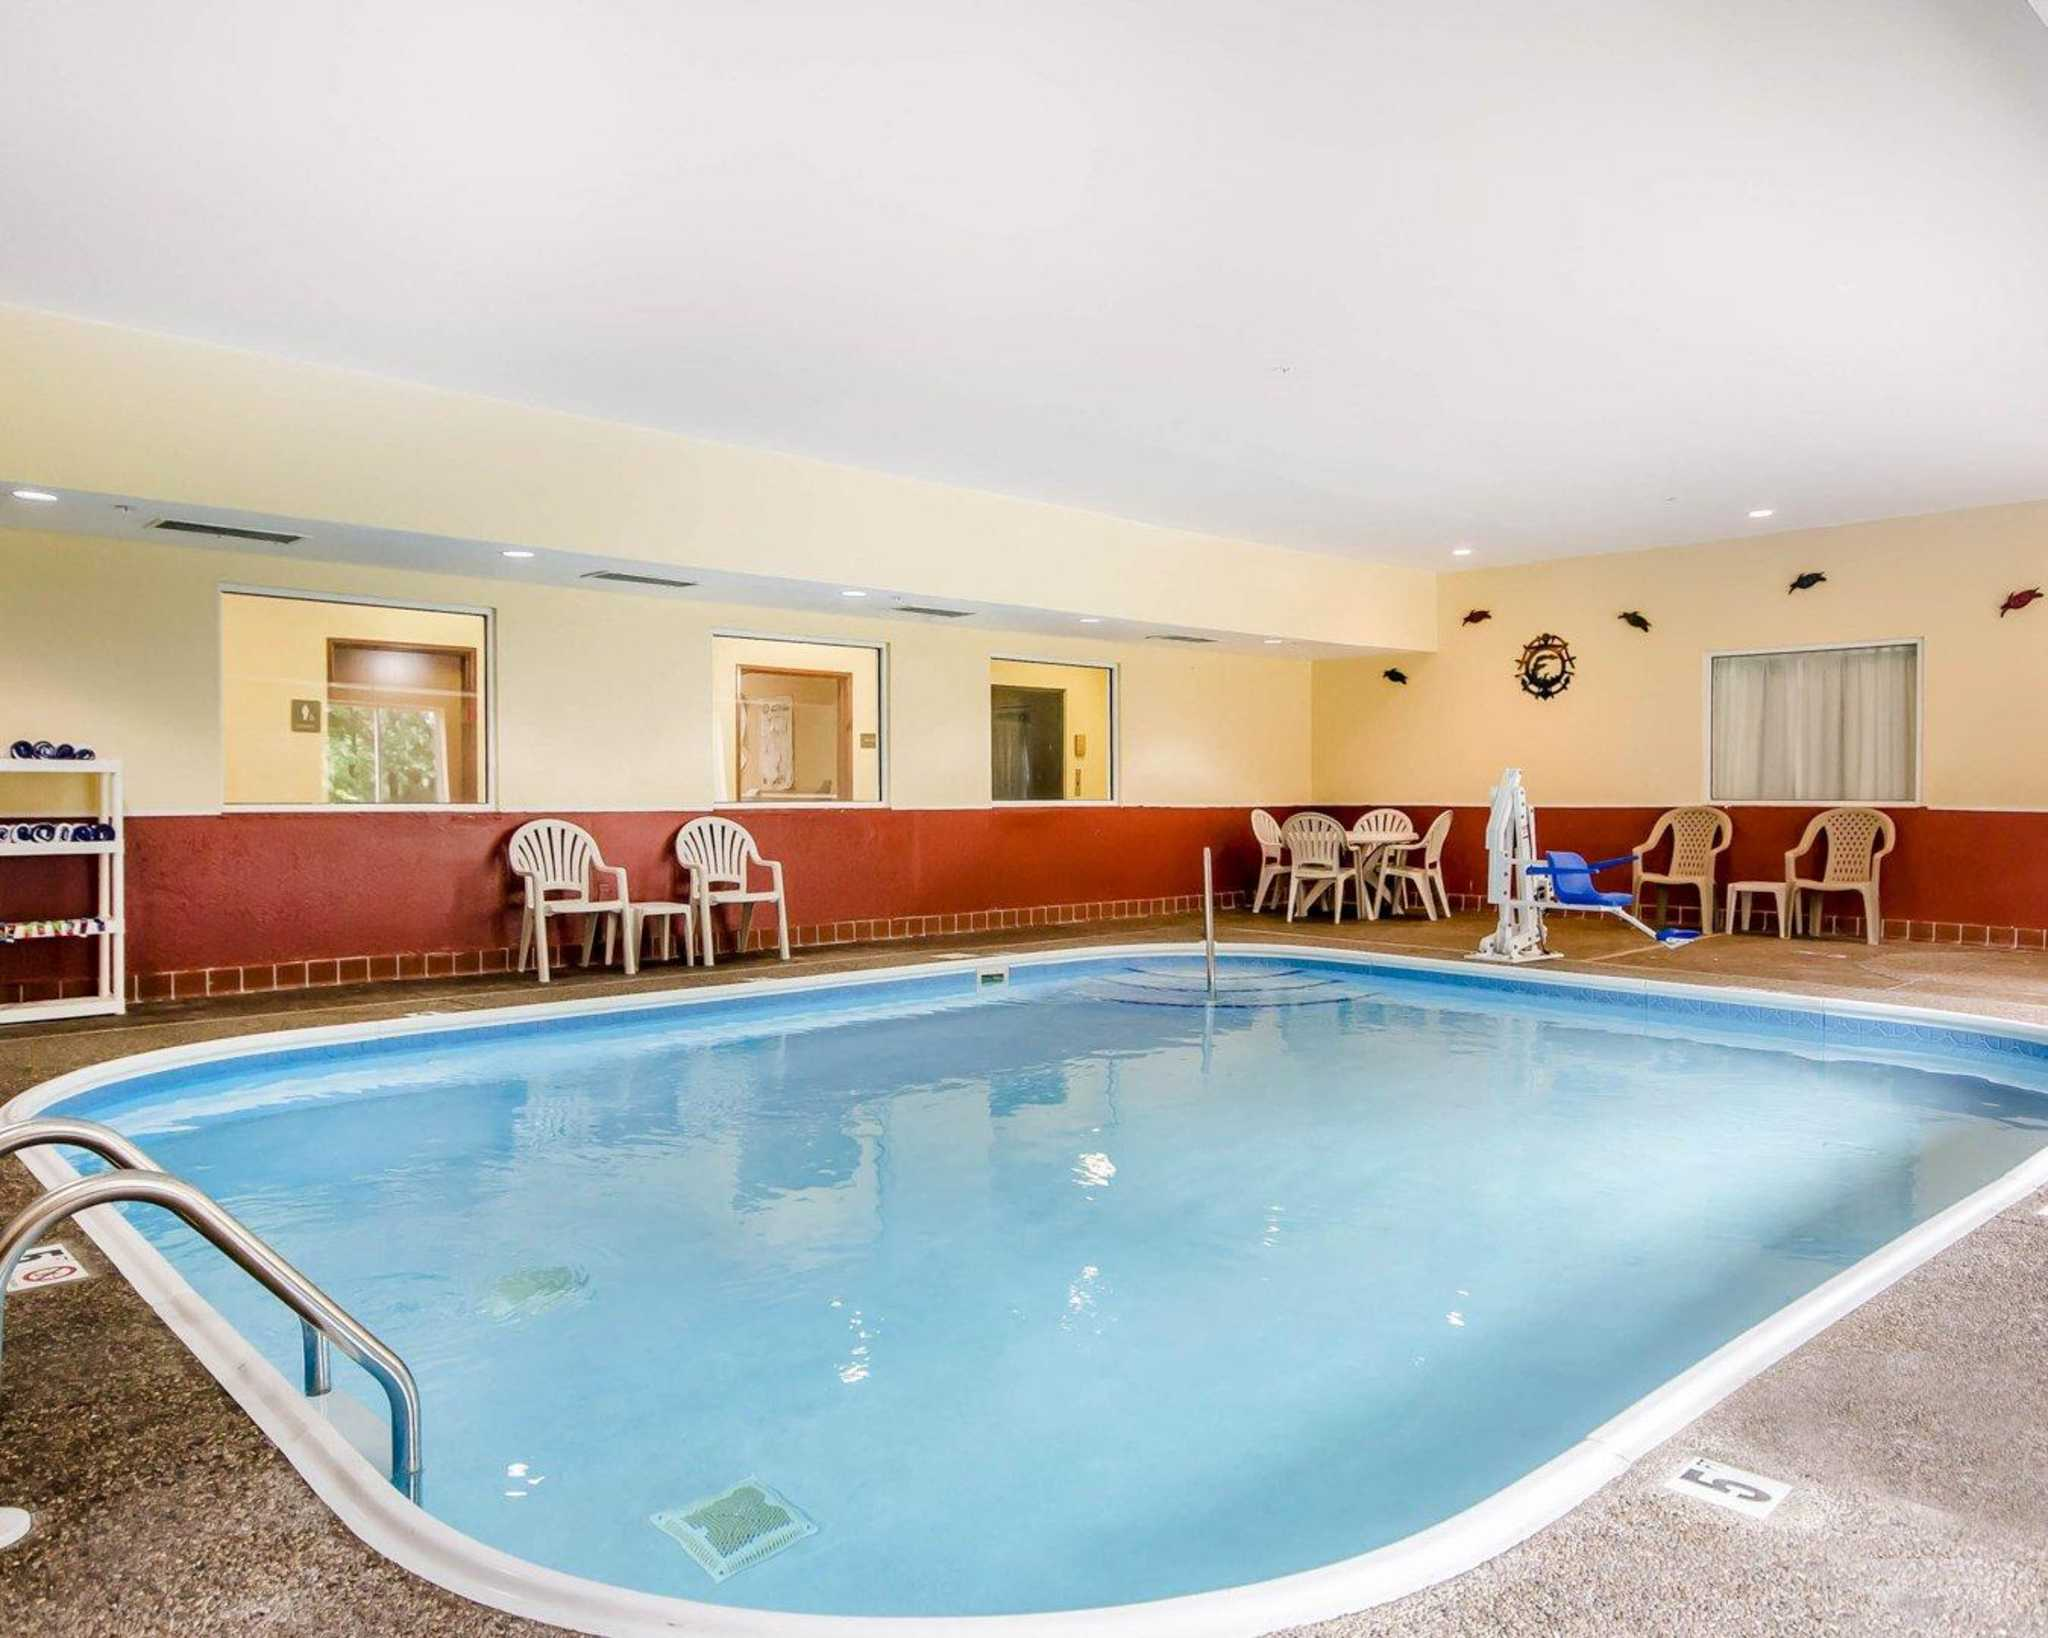 Quality Suites 1500 E Crystal Dr La Grange Ky Hotels Motels Mapquest